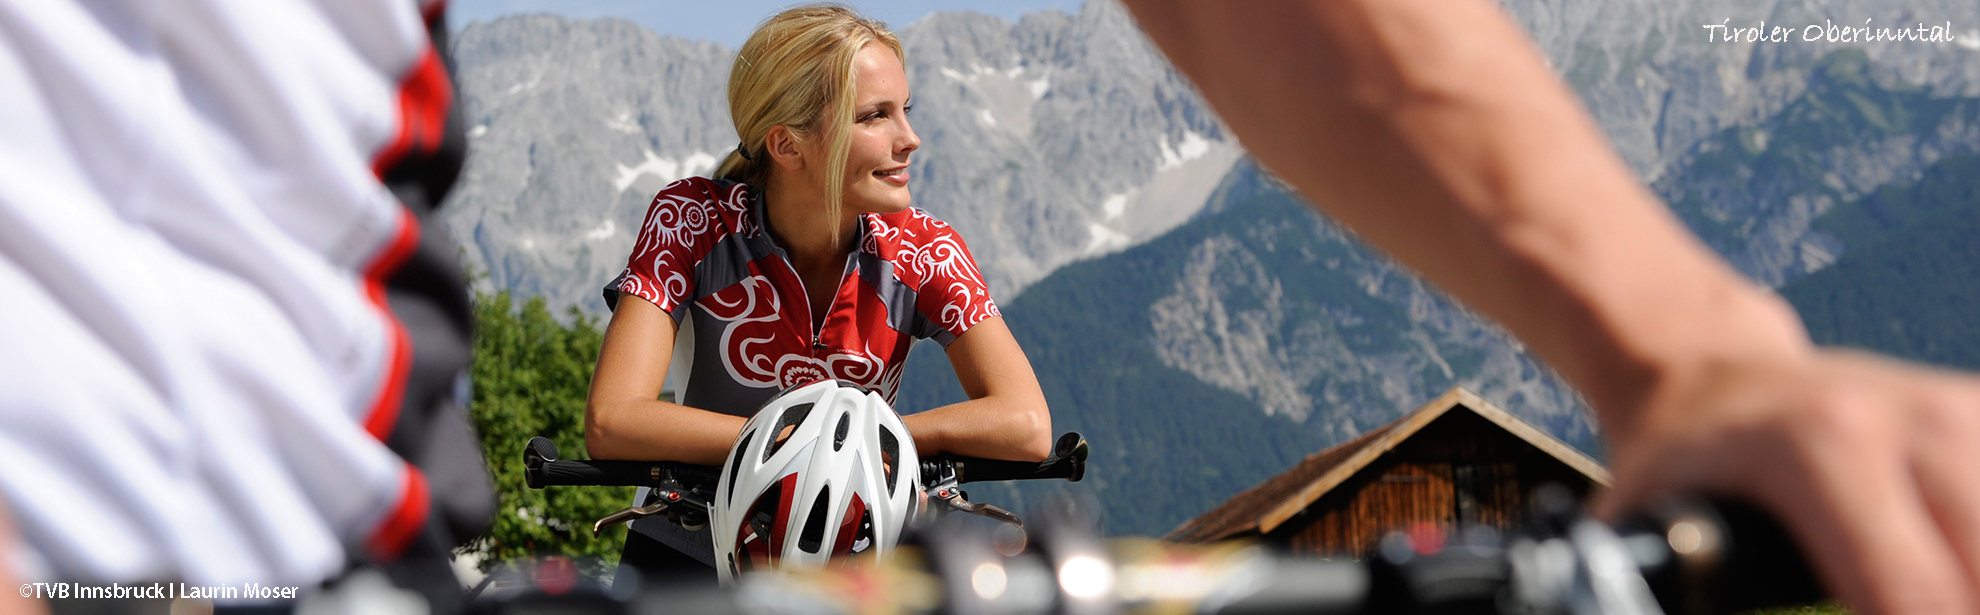 OsportTVB-Innsbruck_2011_856_Laurin-Moser_Tirol-Oberland